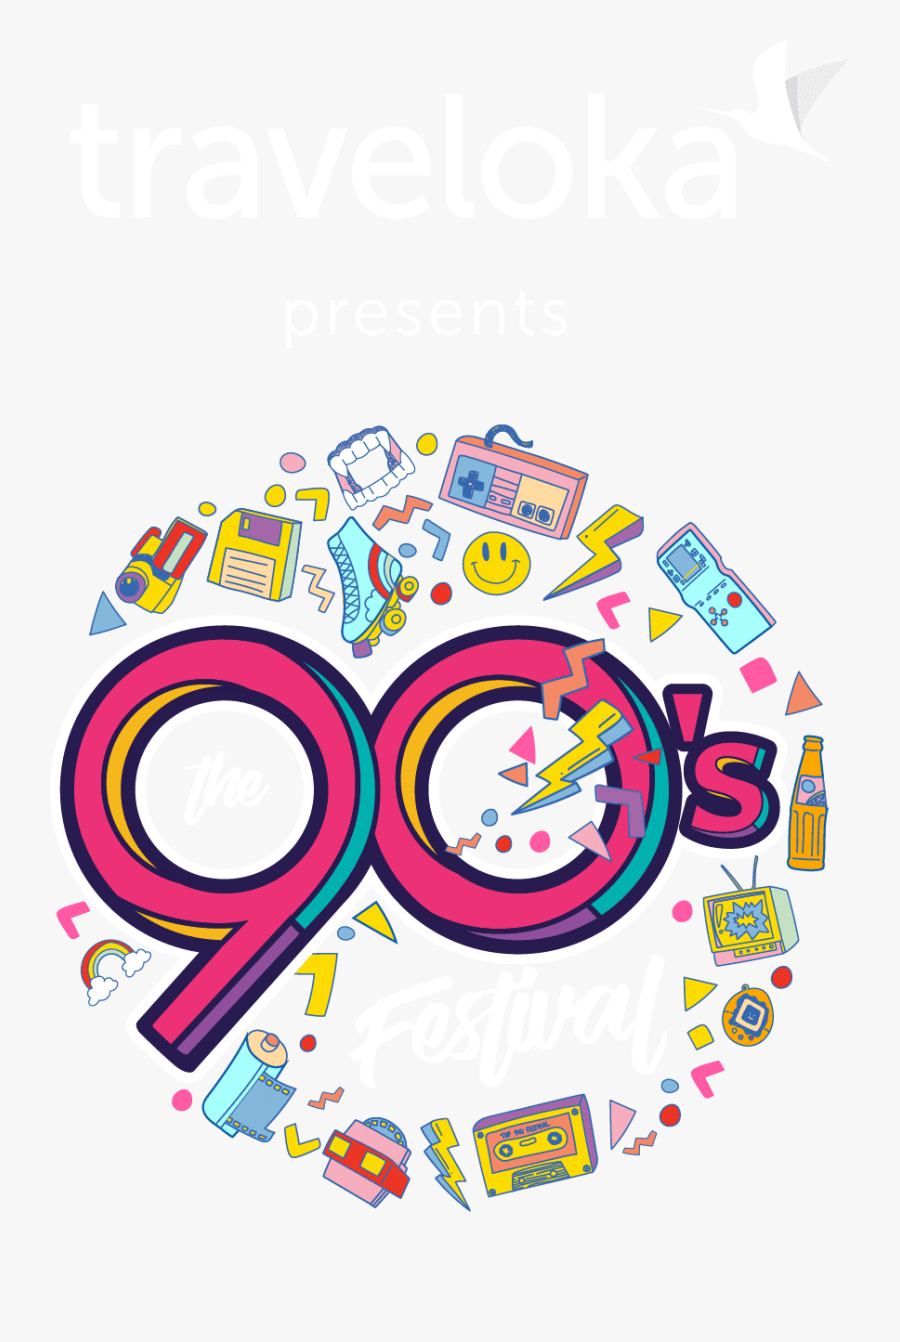 90s Festival 2019 Jakarta, Transparent Clipart